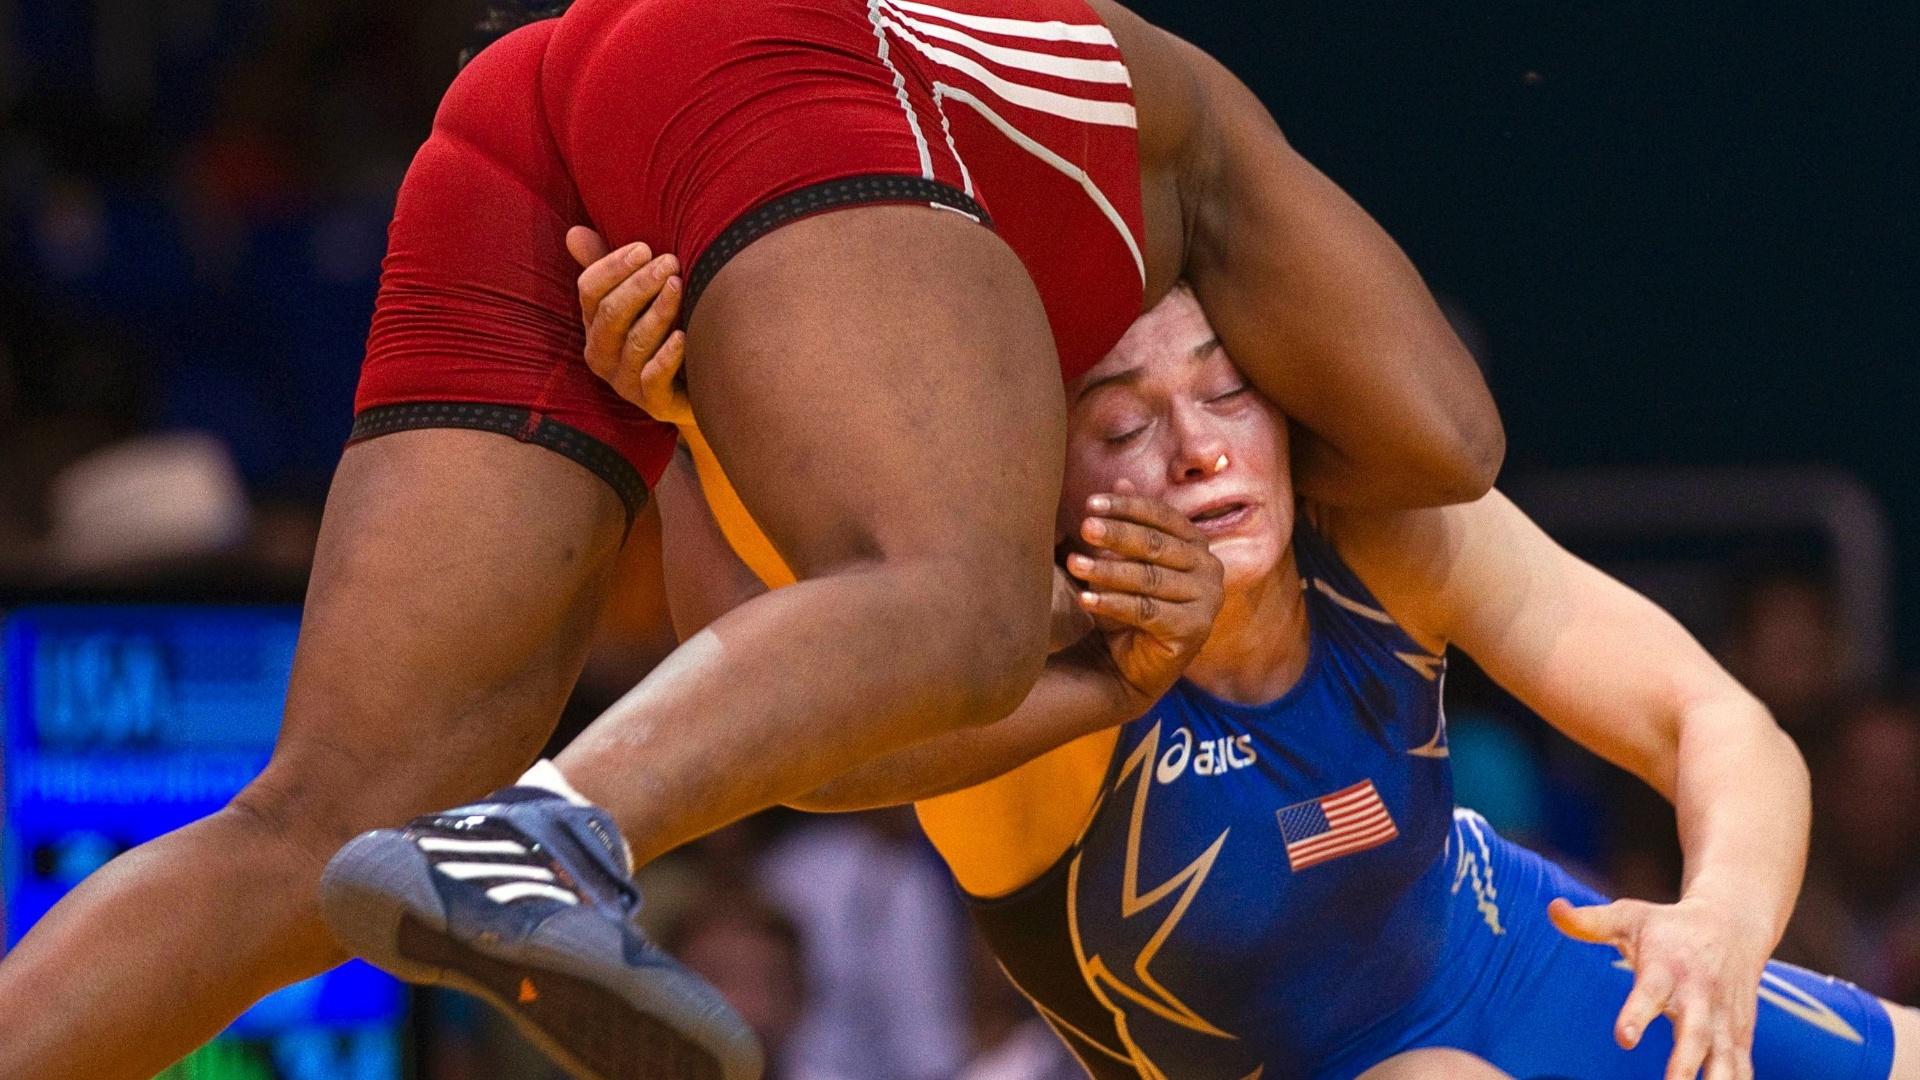 A cubana Katerina Vidiaux derrotou a norte-americana Elena Pirozhkov na final da categoria até 63kg da luta olímpica